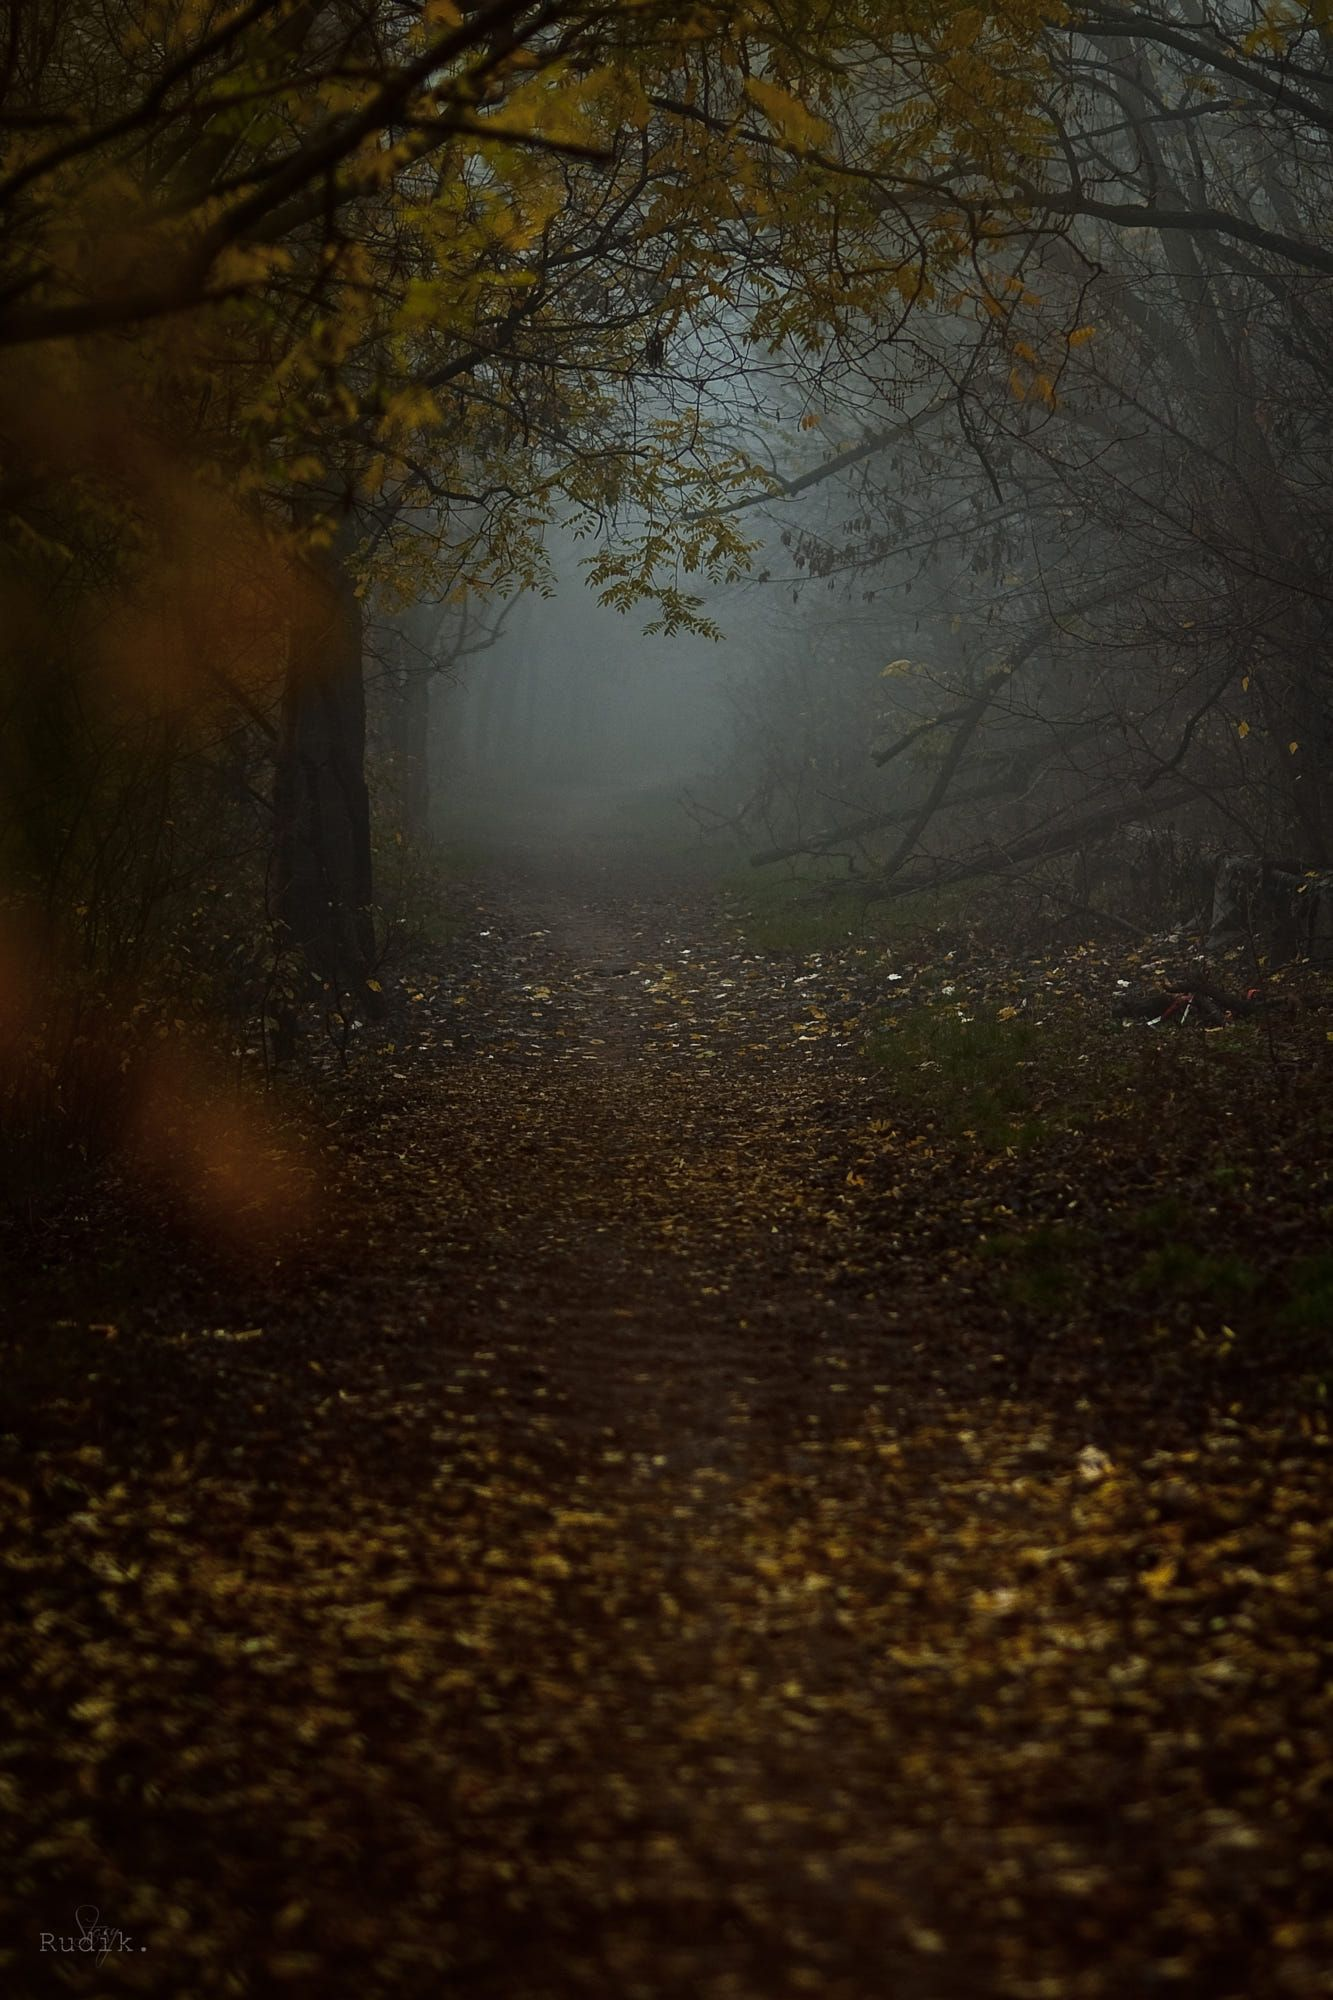 Darkness within by Stasy Kiktenko